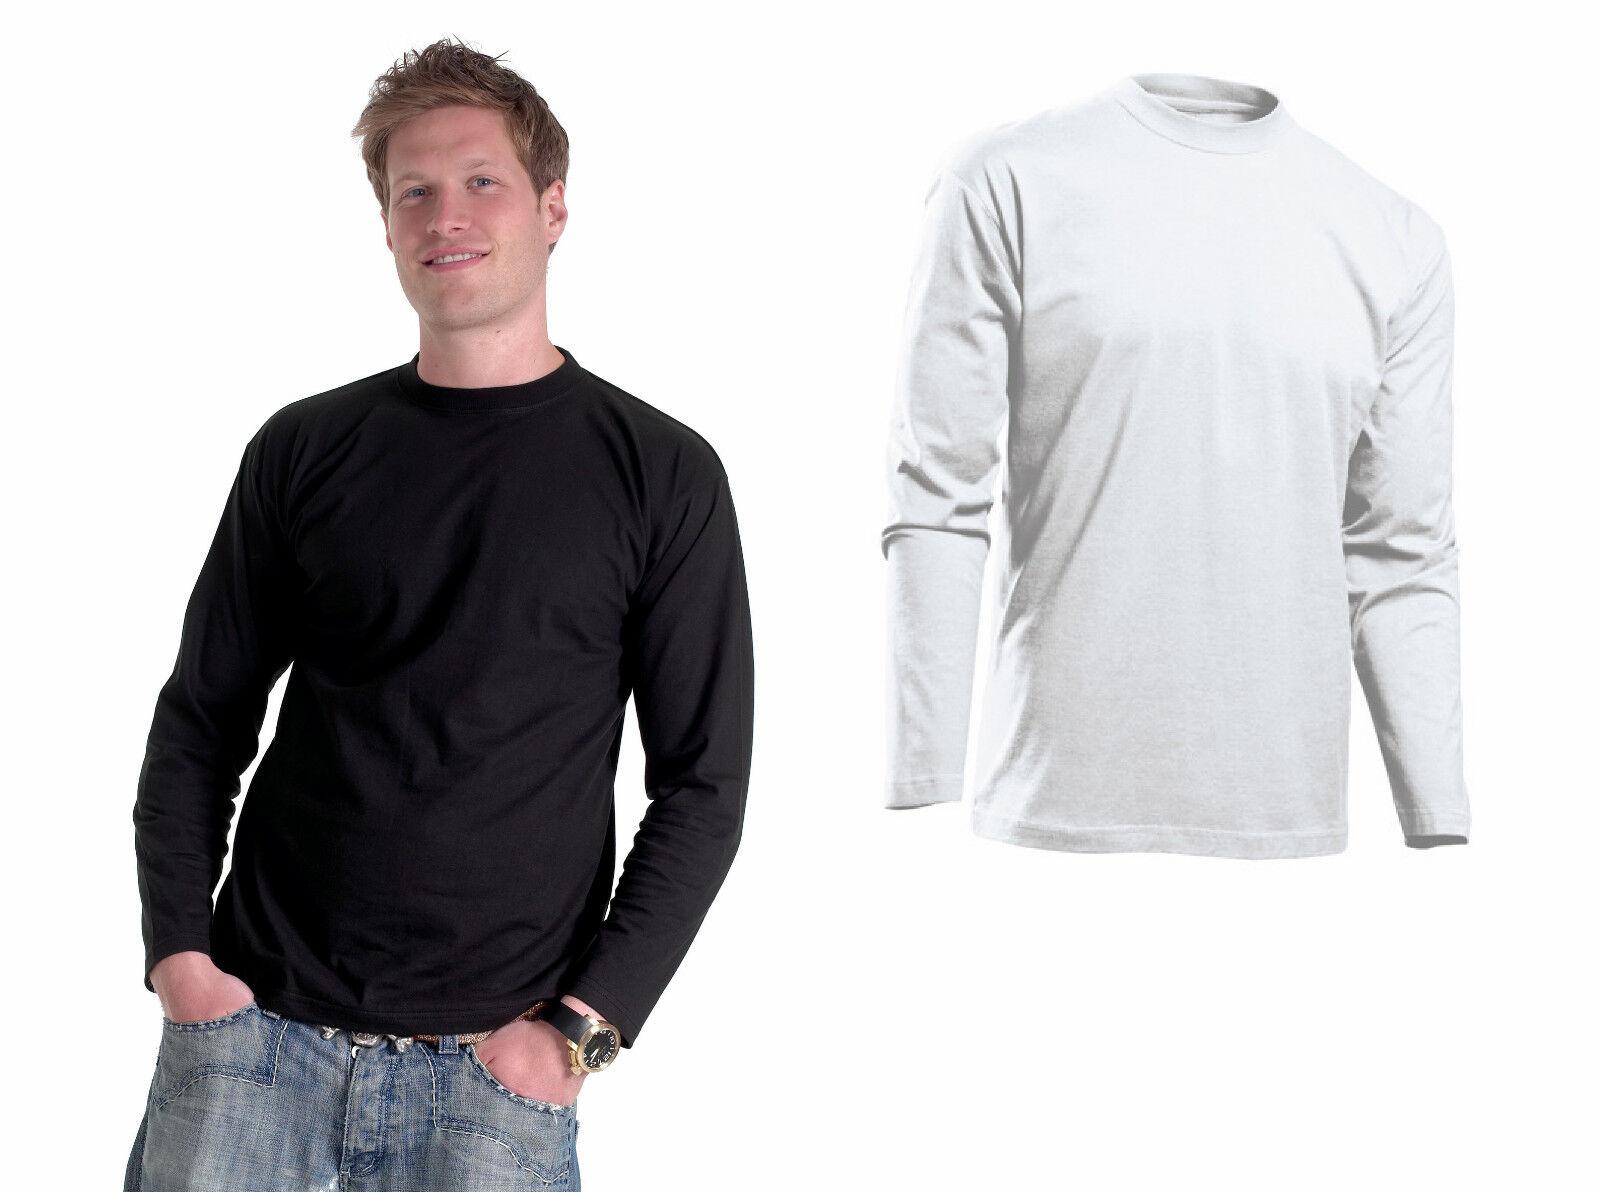 - manga larga camisa talla s-3xl 4xl negro blanco camiseta manga larga camisa jersey sudadera